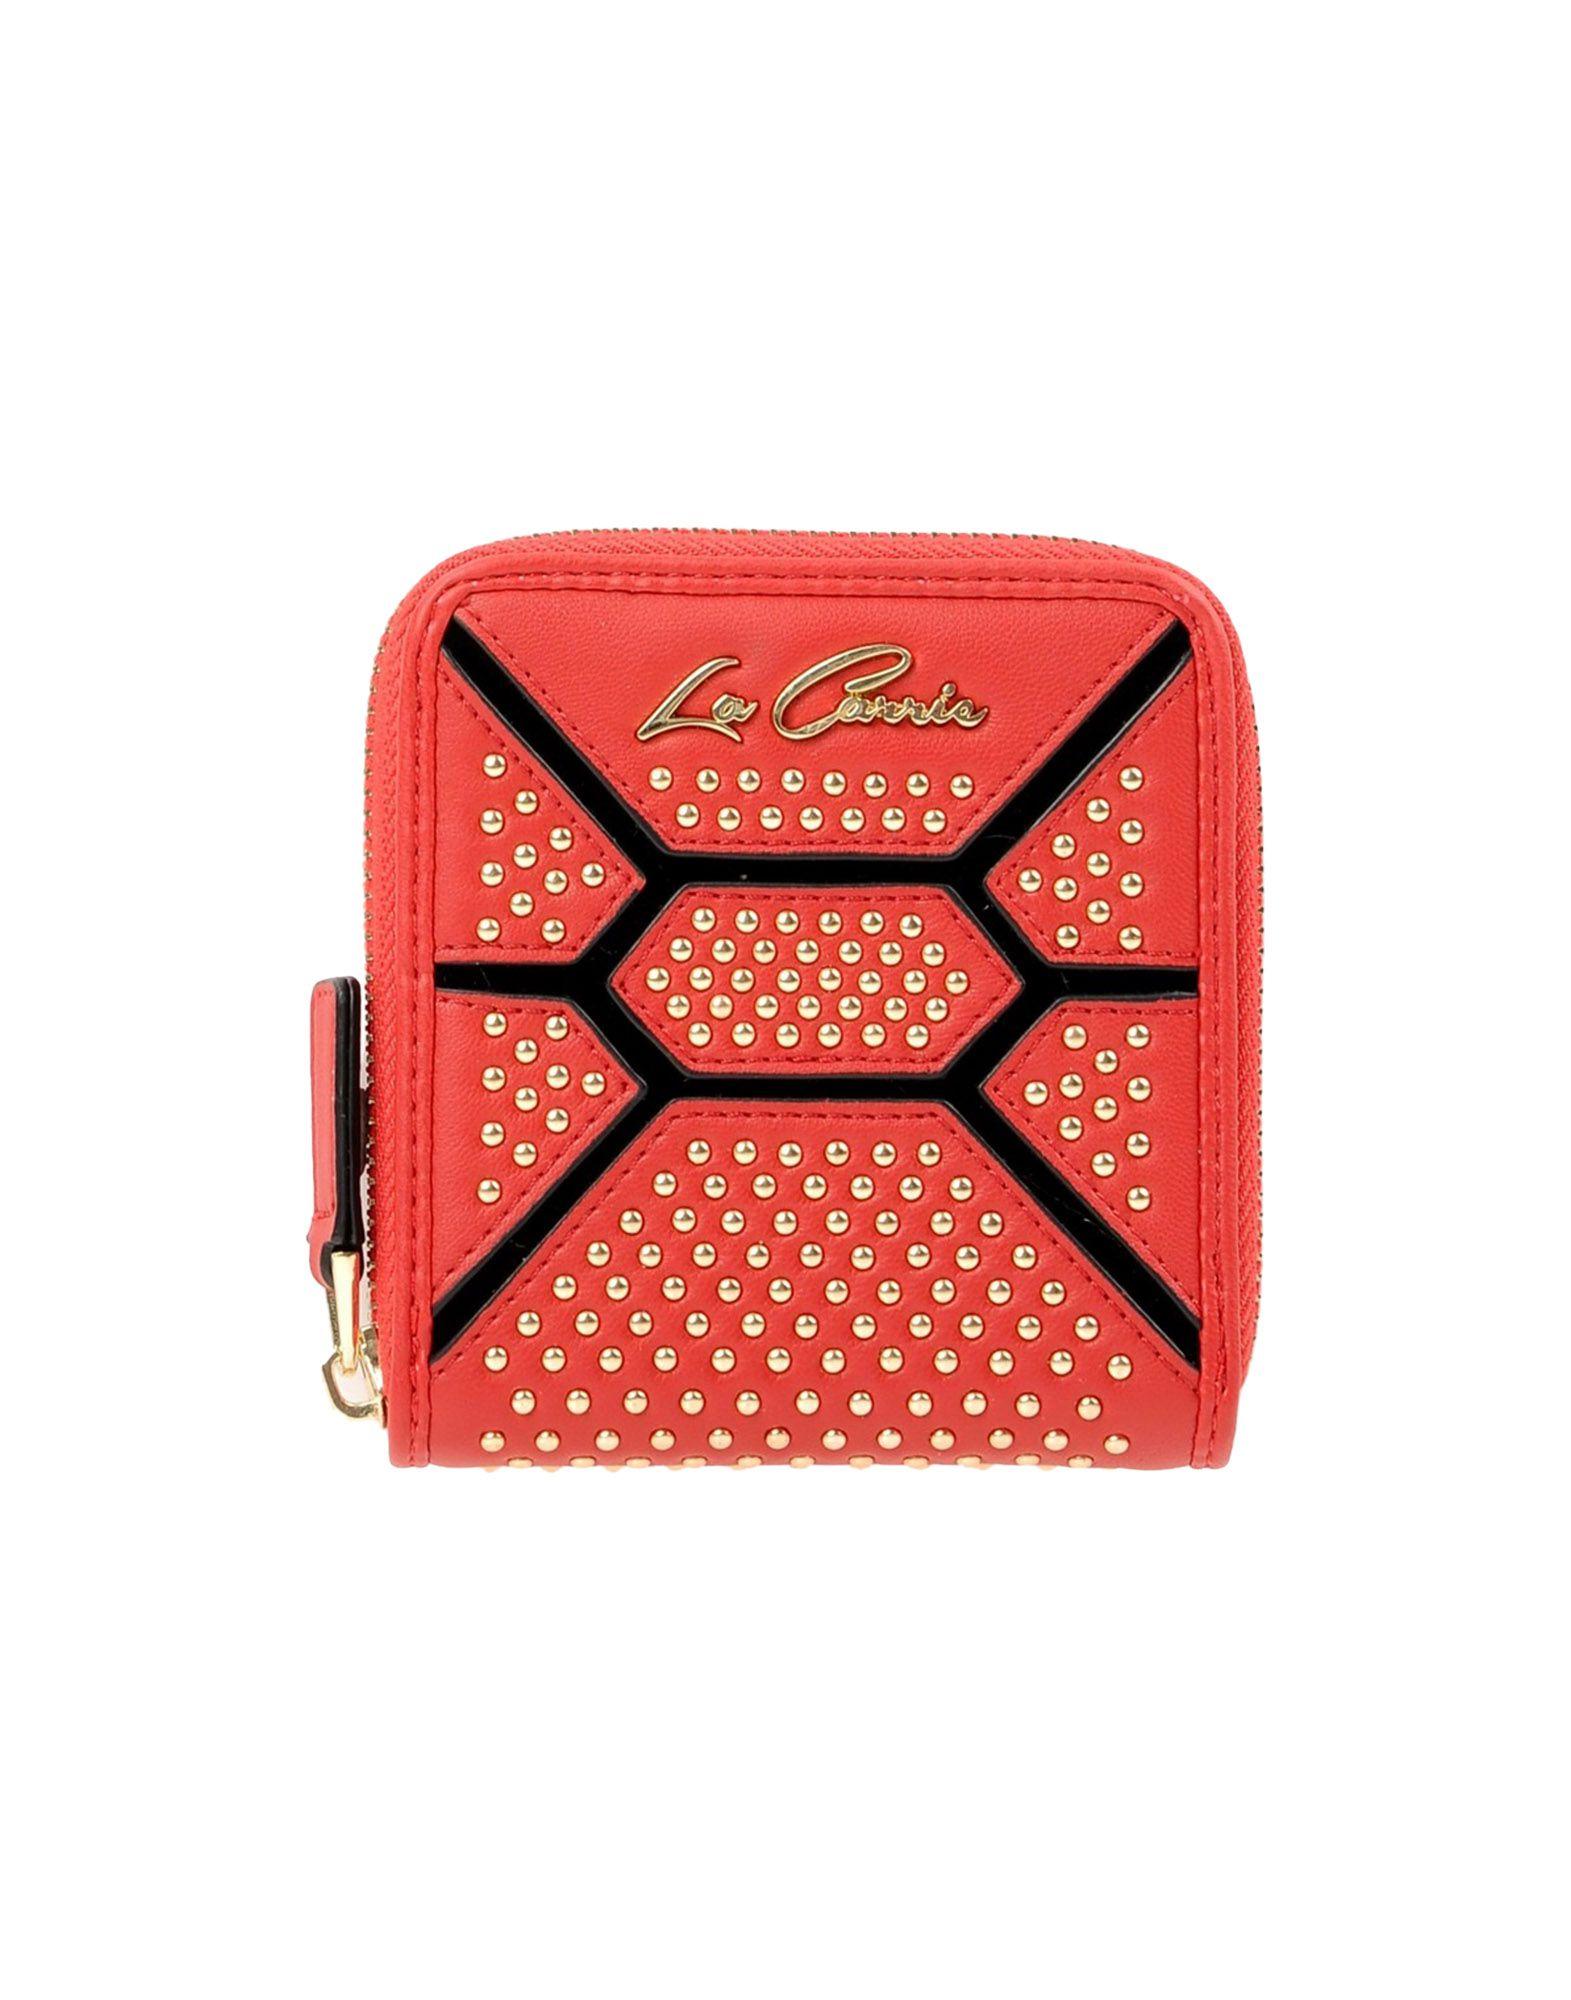 LA CARRIE BAG Damen Brieftasche Farbe Rot Größe 1